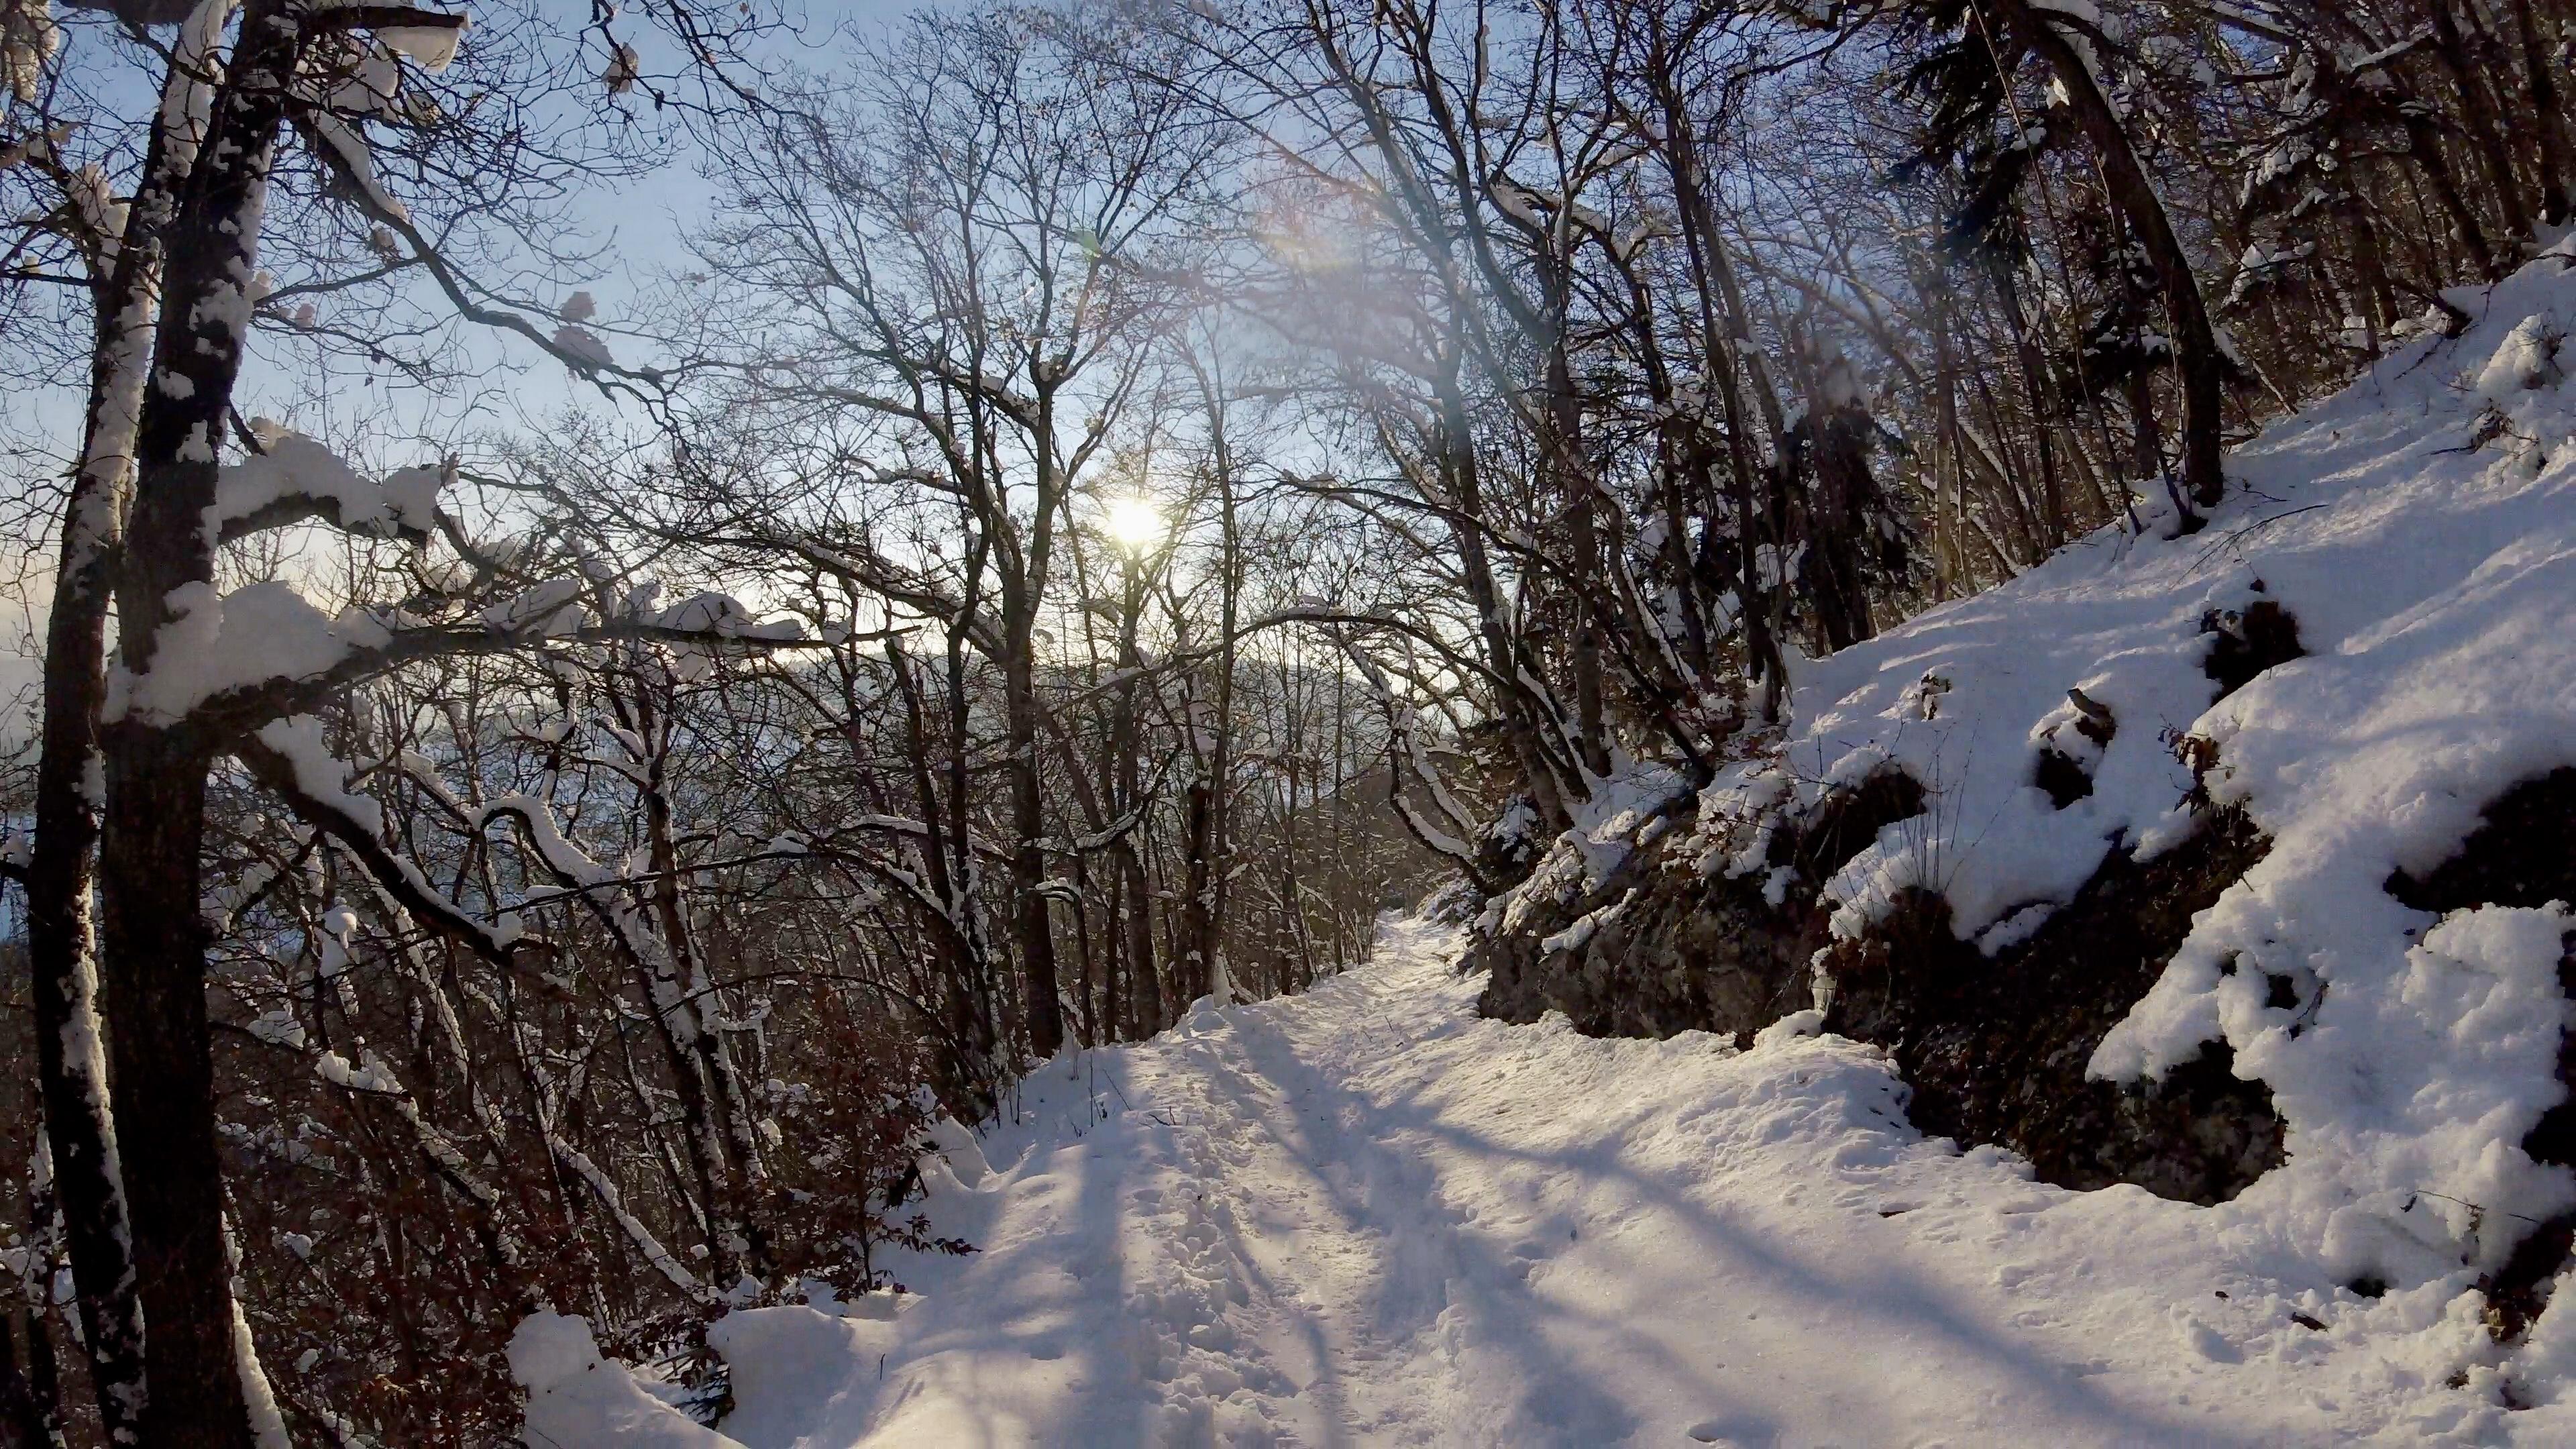 Downhill from the Montagne de Romont.